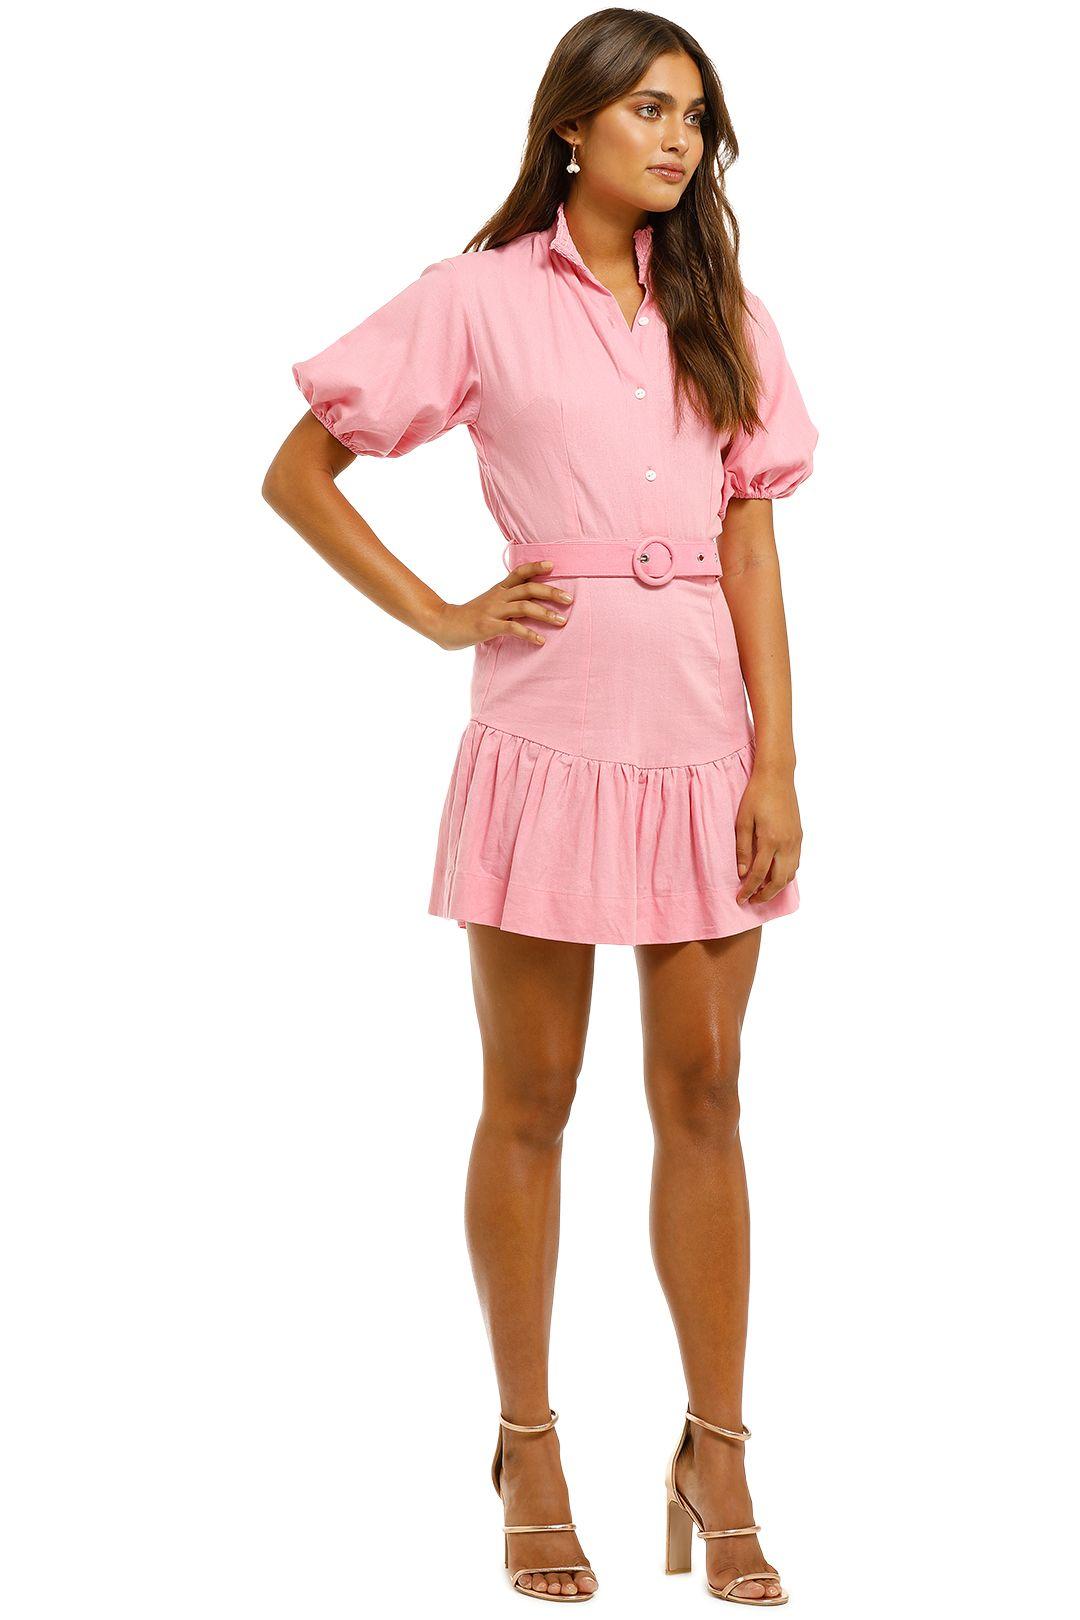 SWF-Haze-Mini-Shirt-Dress-Haze-Side